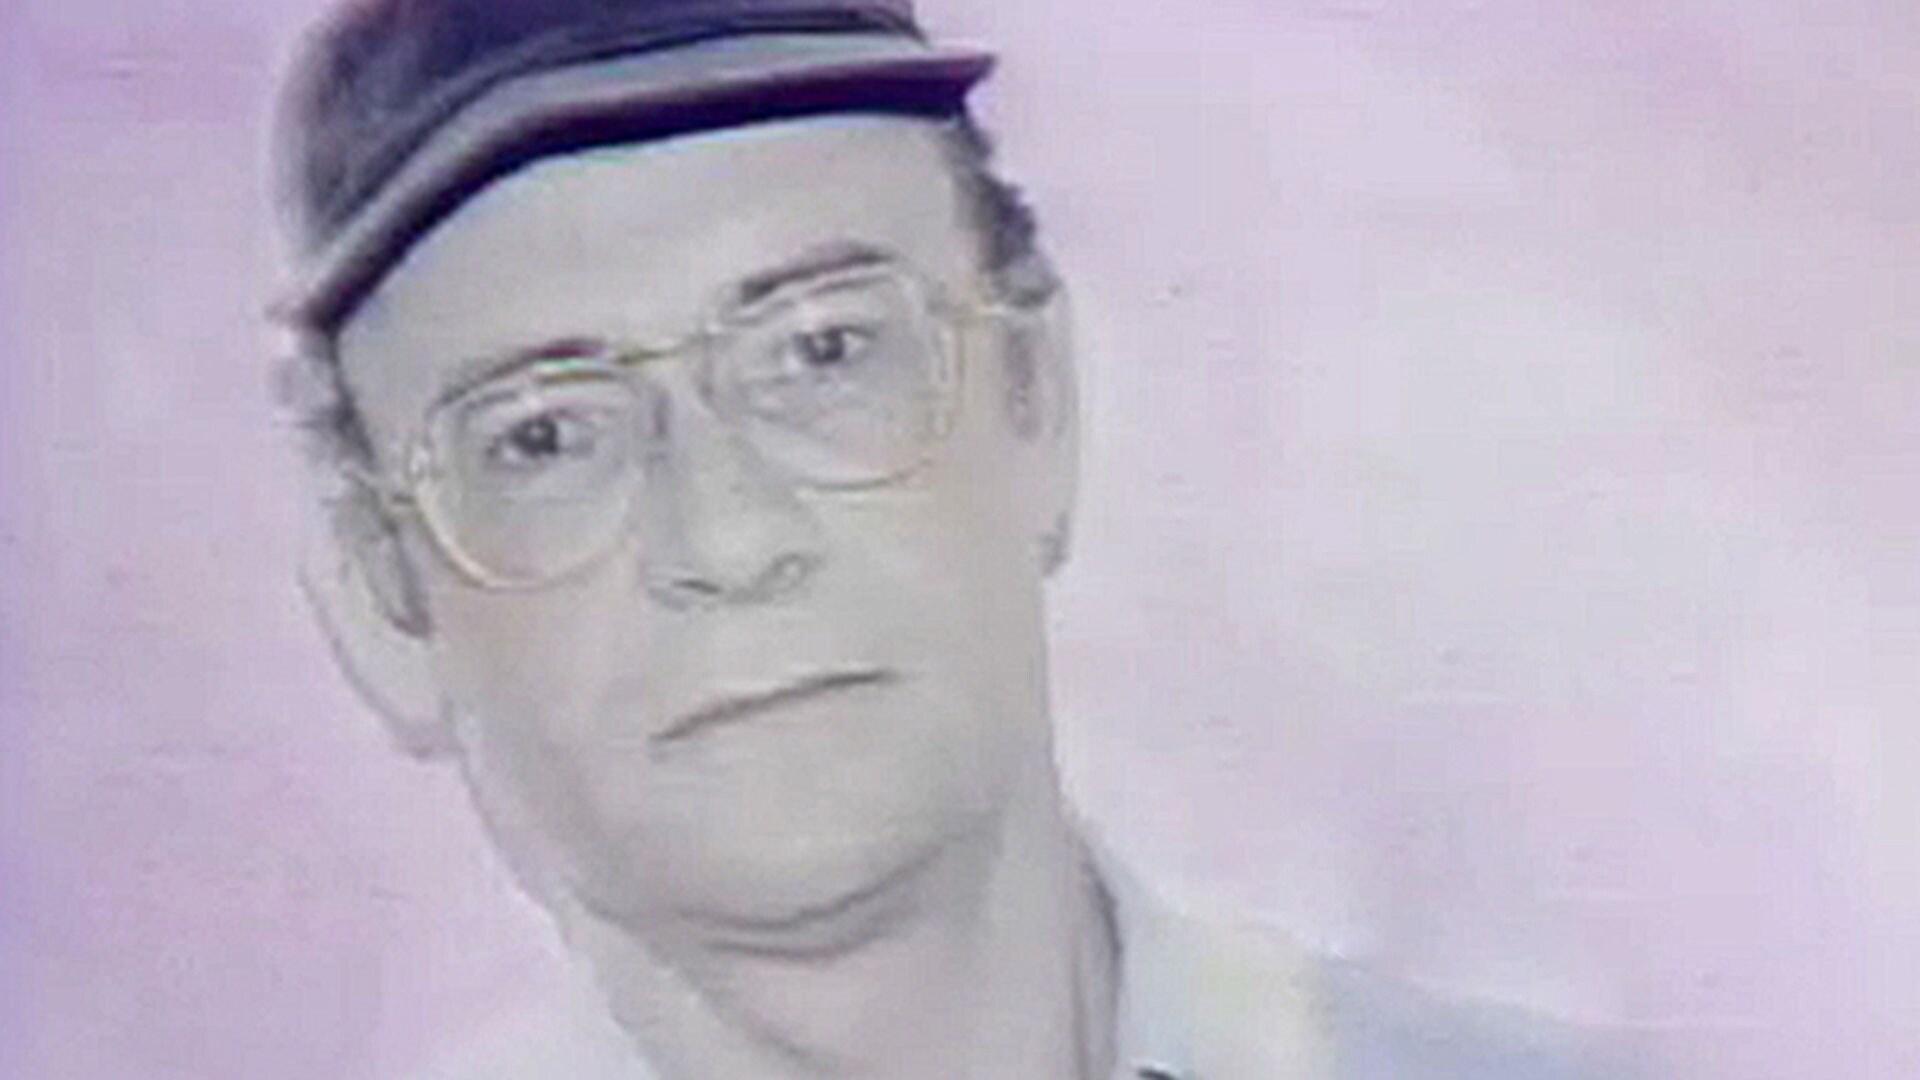 Buck Henry: May 26, 1979